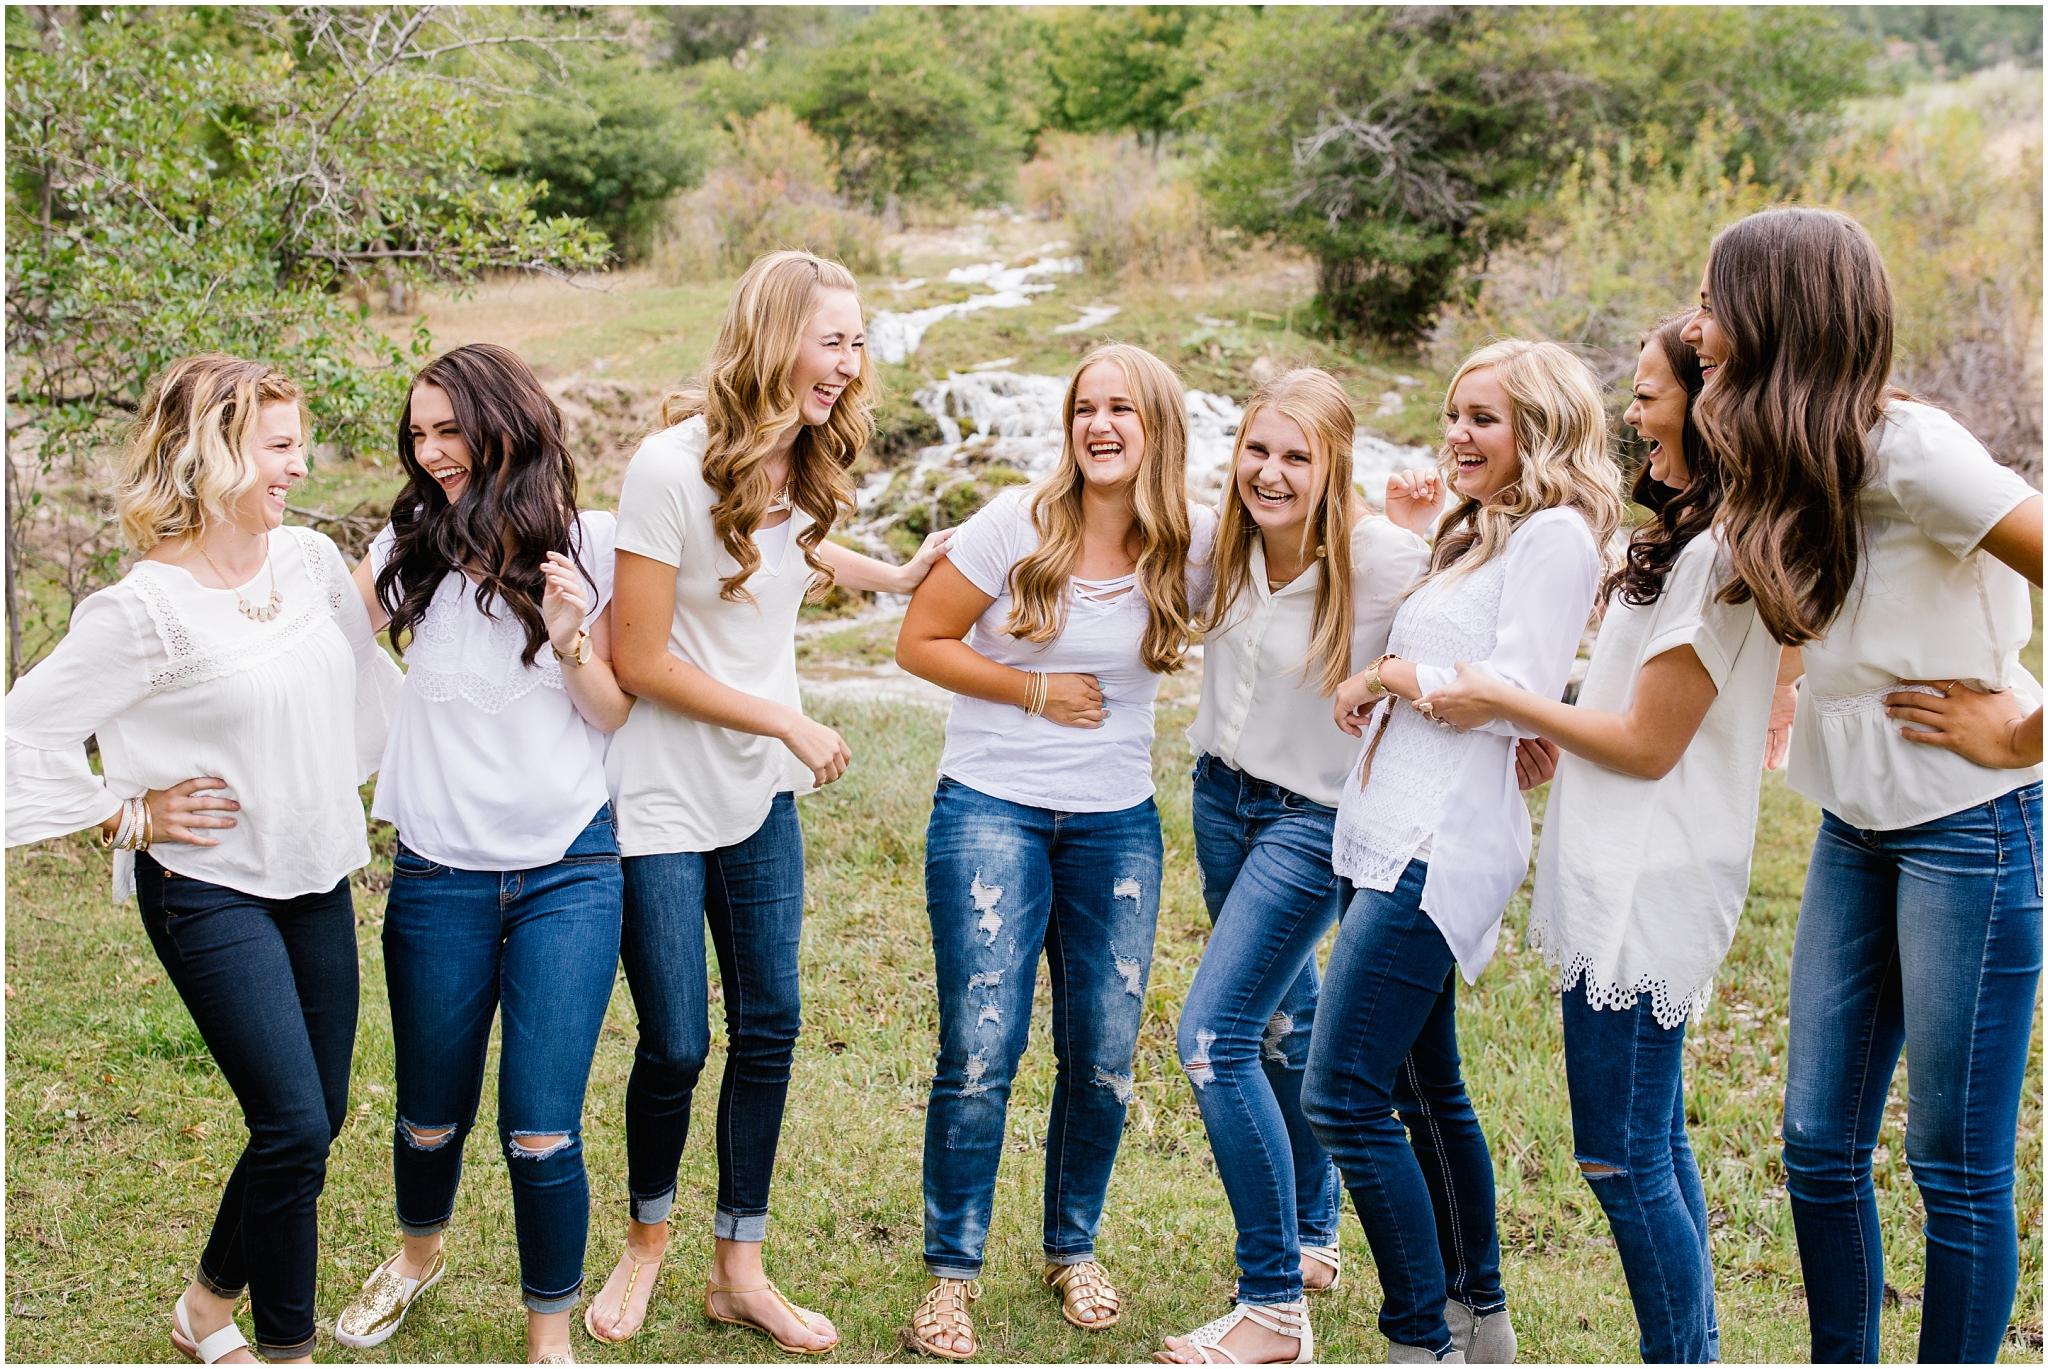 GVHSDRILL-28_Lizzie-B-Imagery-Utah-Family-Photographer-Central-Utah-Park-City-Salt-Lake-City-Drill-Team-Photography-Dance.jpg